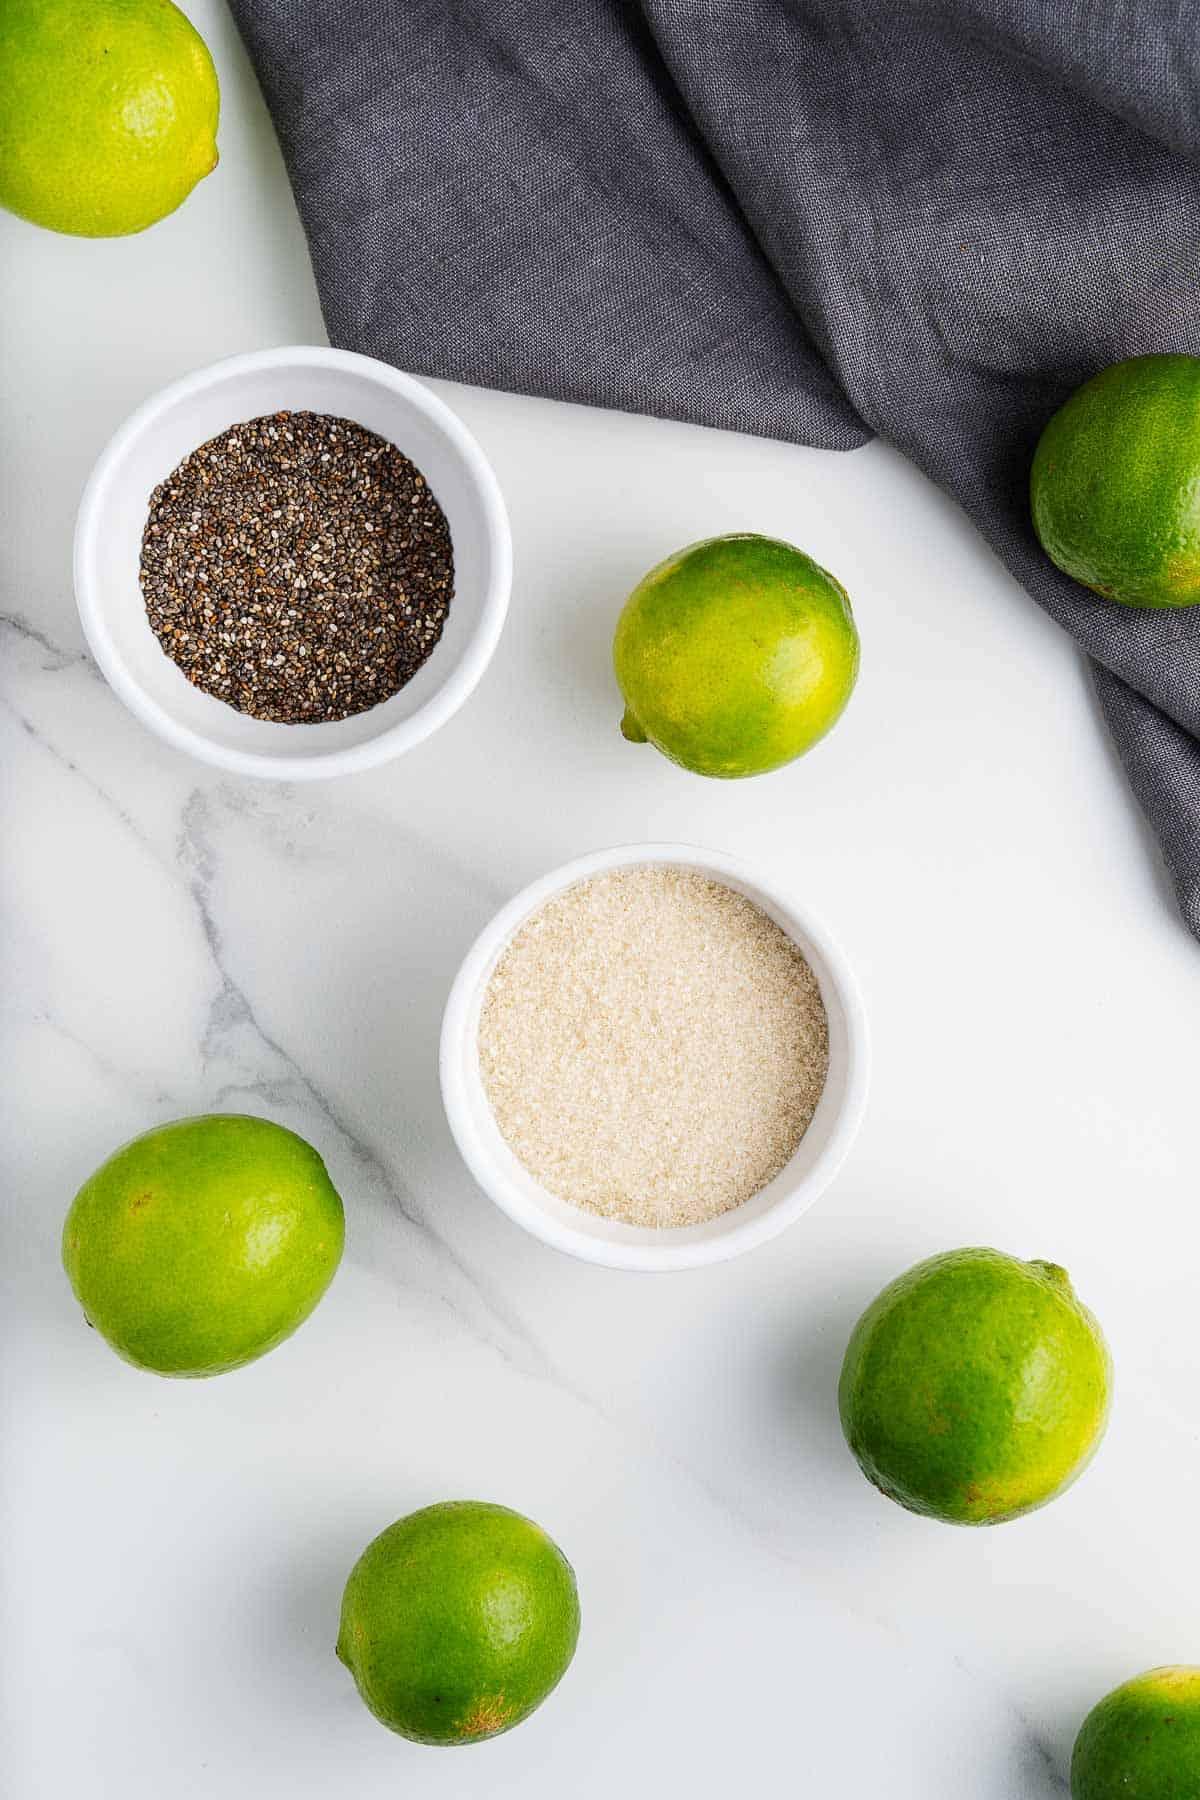 Chia Seeds, Limes, and Cane Sugar